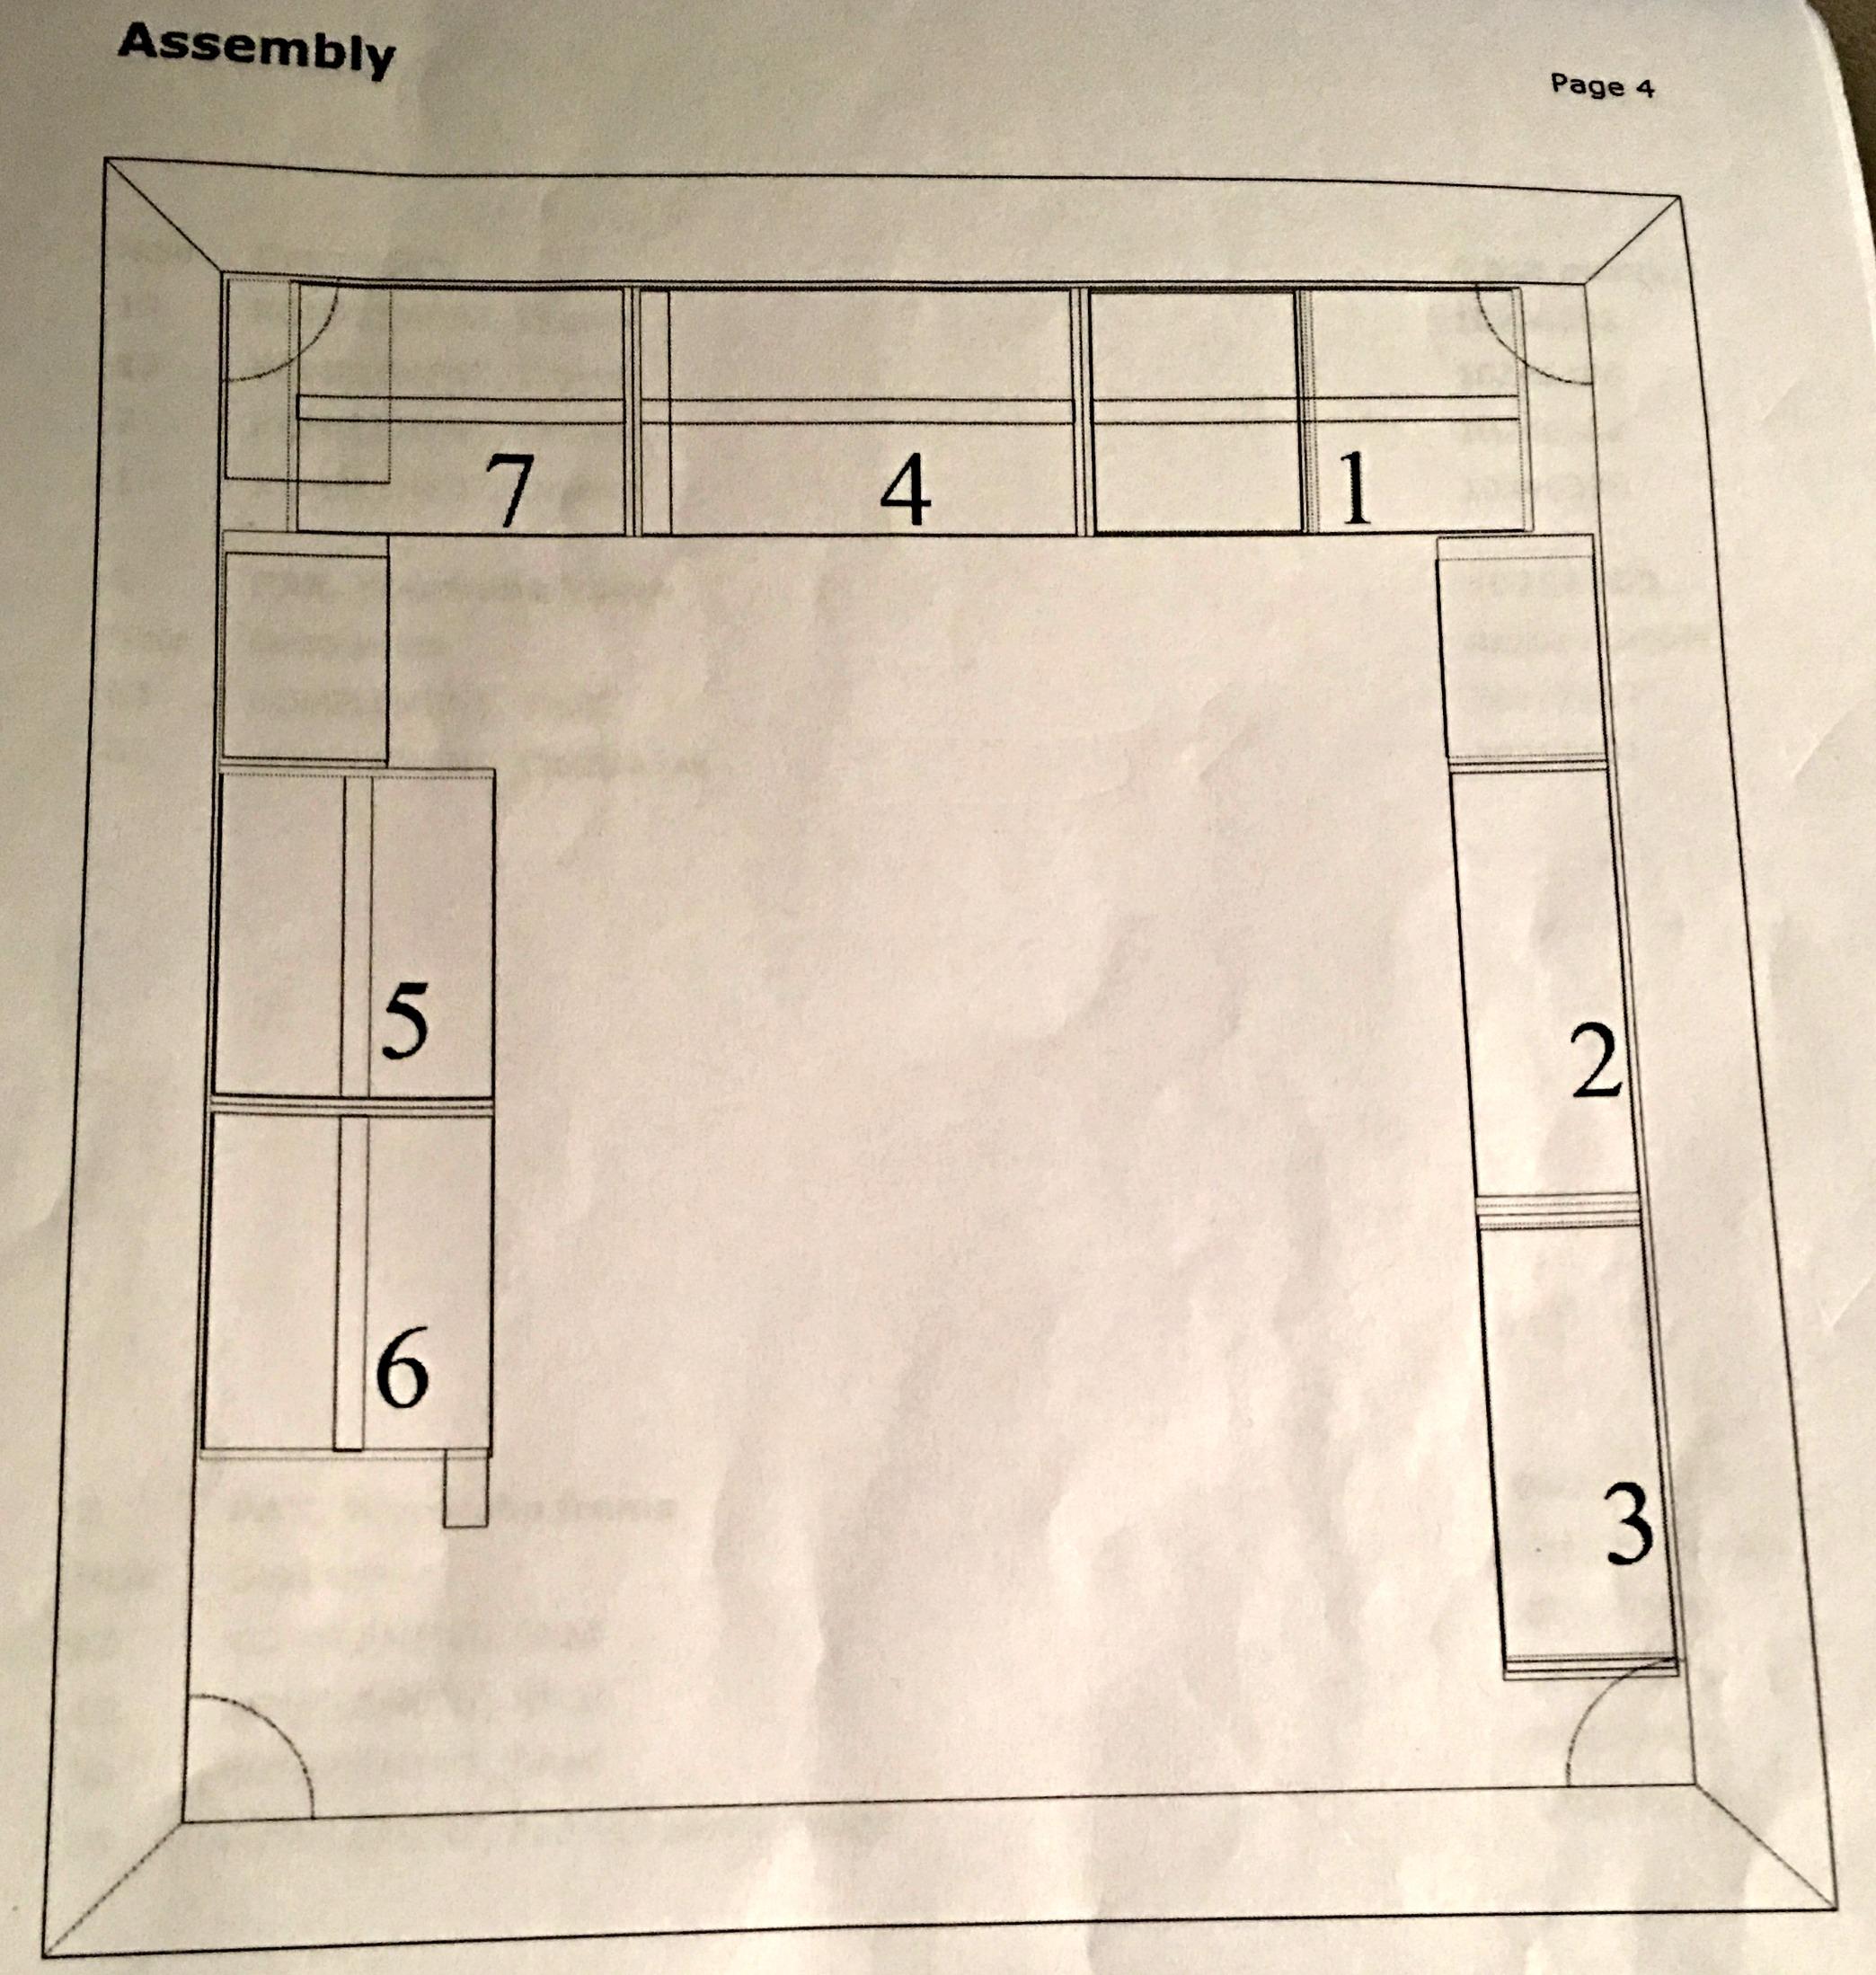 100 pax planner ikea kitchen design pictures online. Black Bedroom Furniture Sets. Home Design Ideas